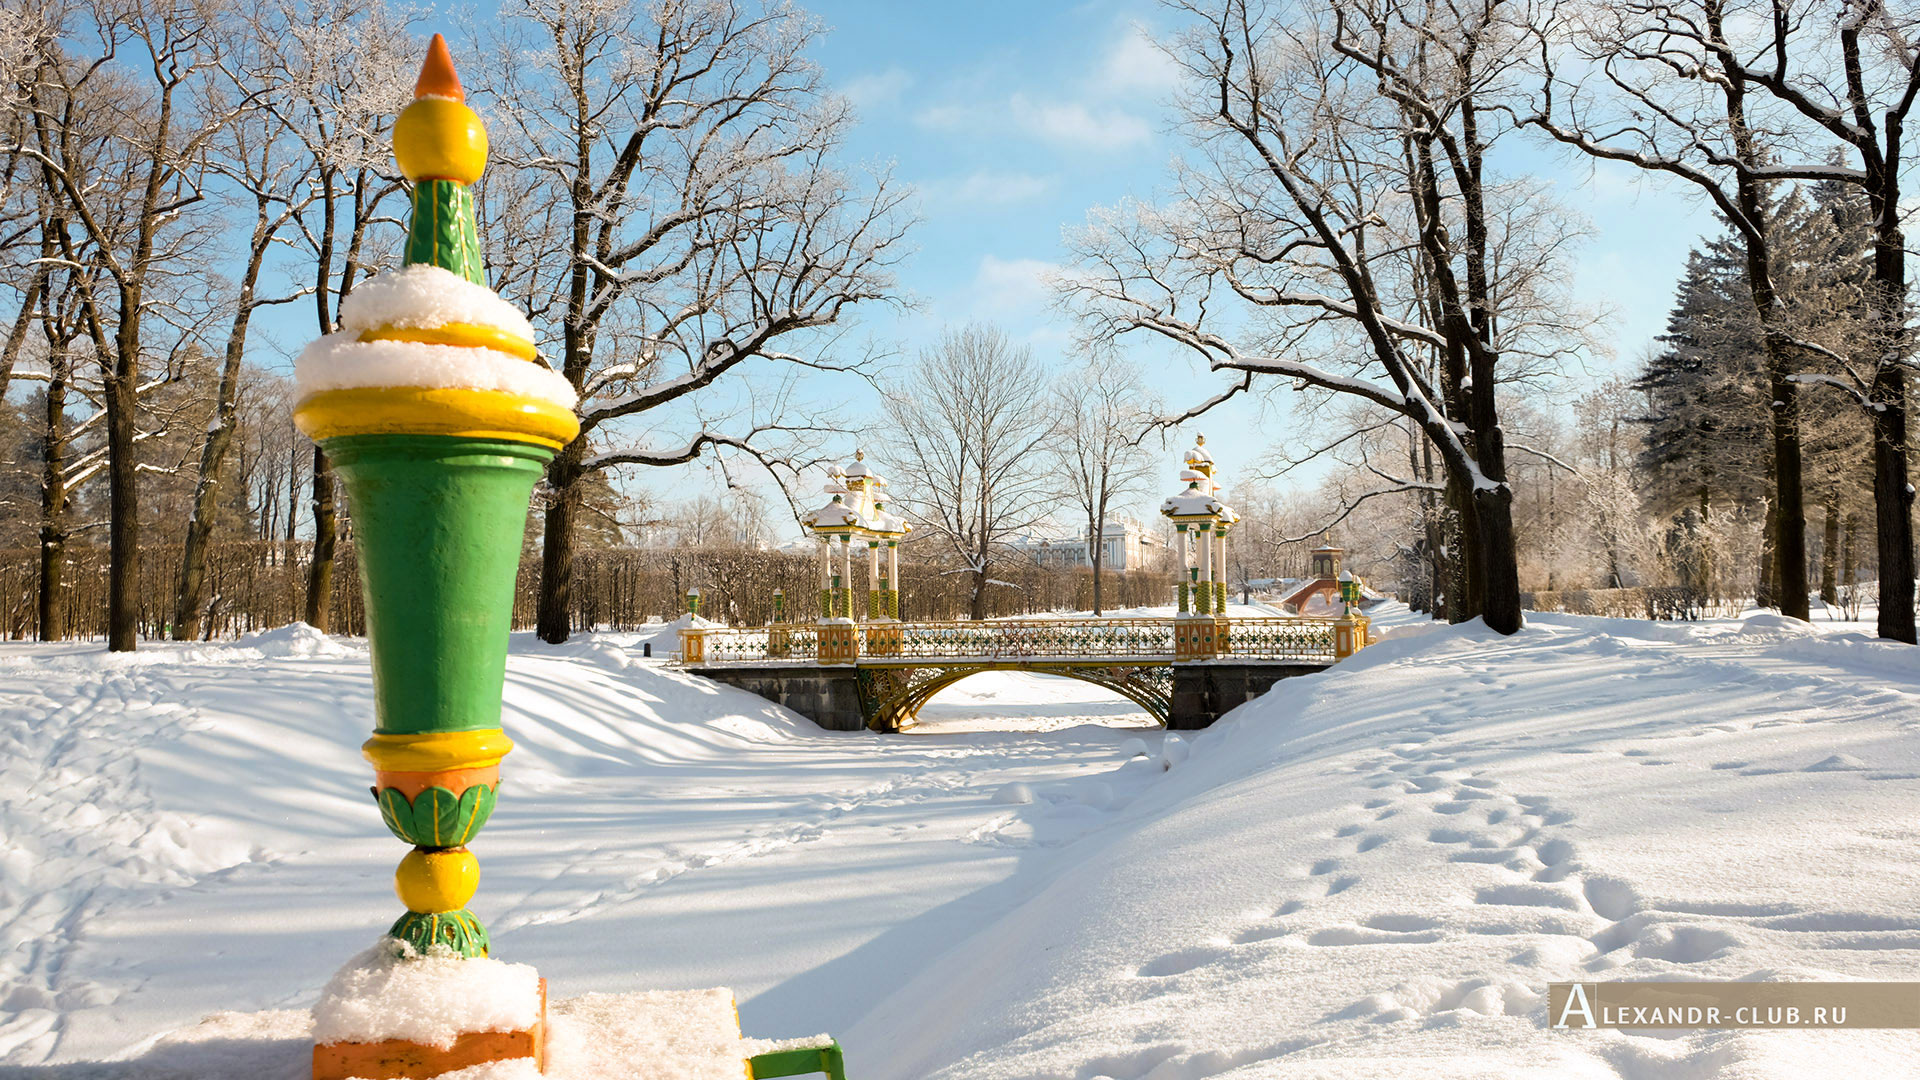 Пушкин, Царское Село, зима, Александровский парк, Китайские мостики